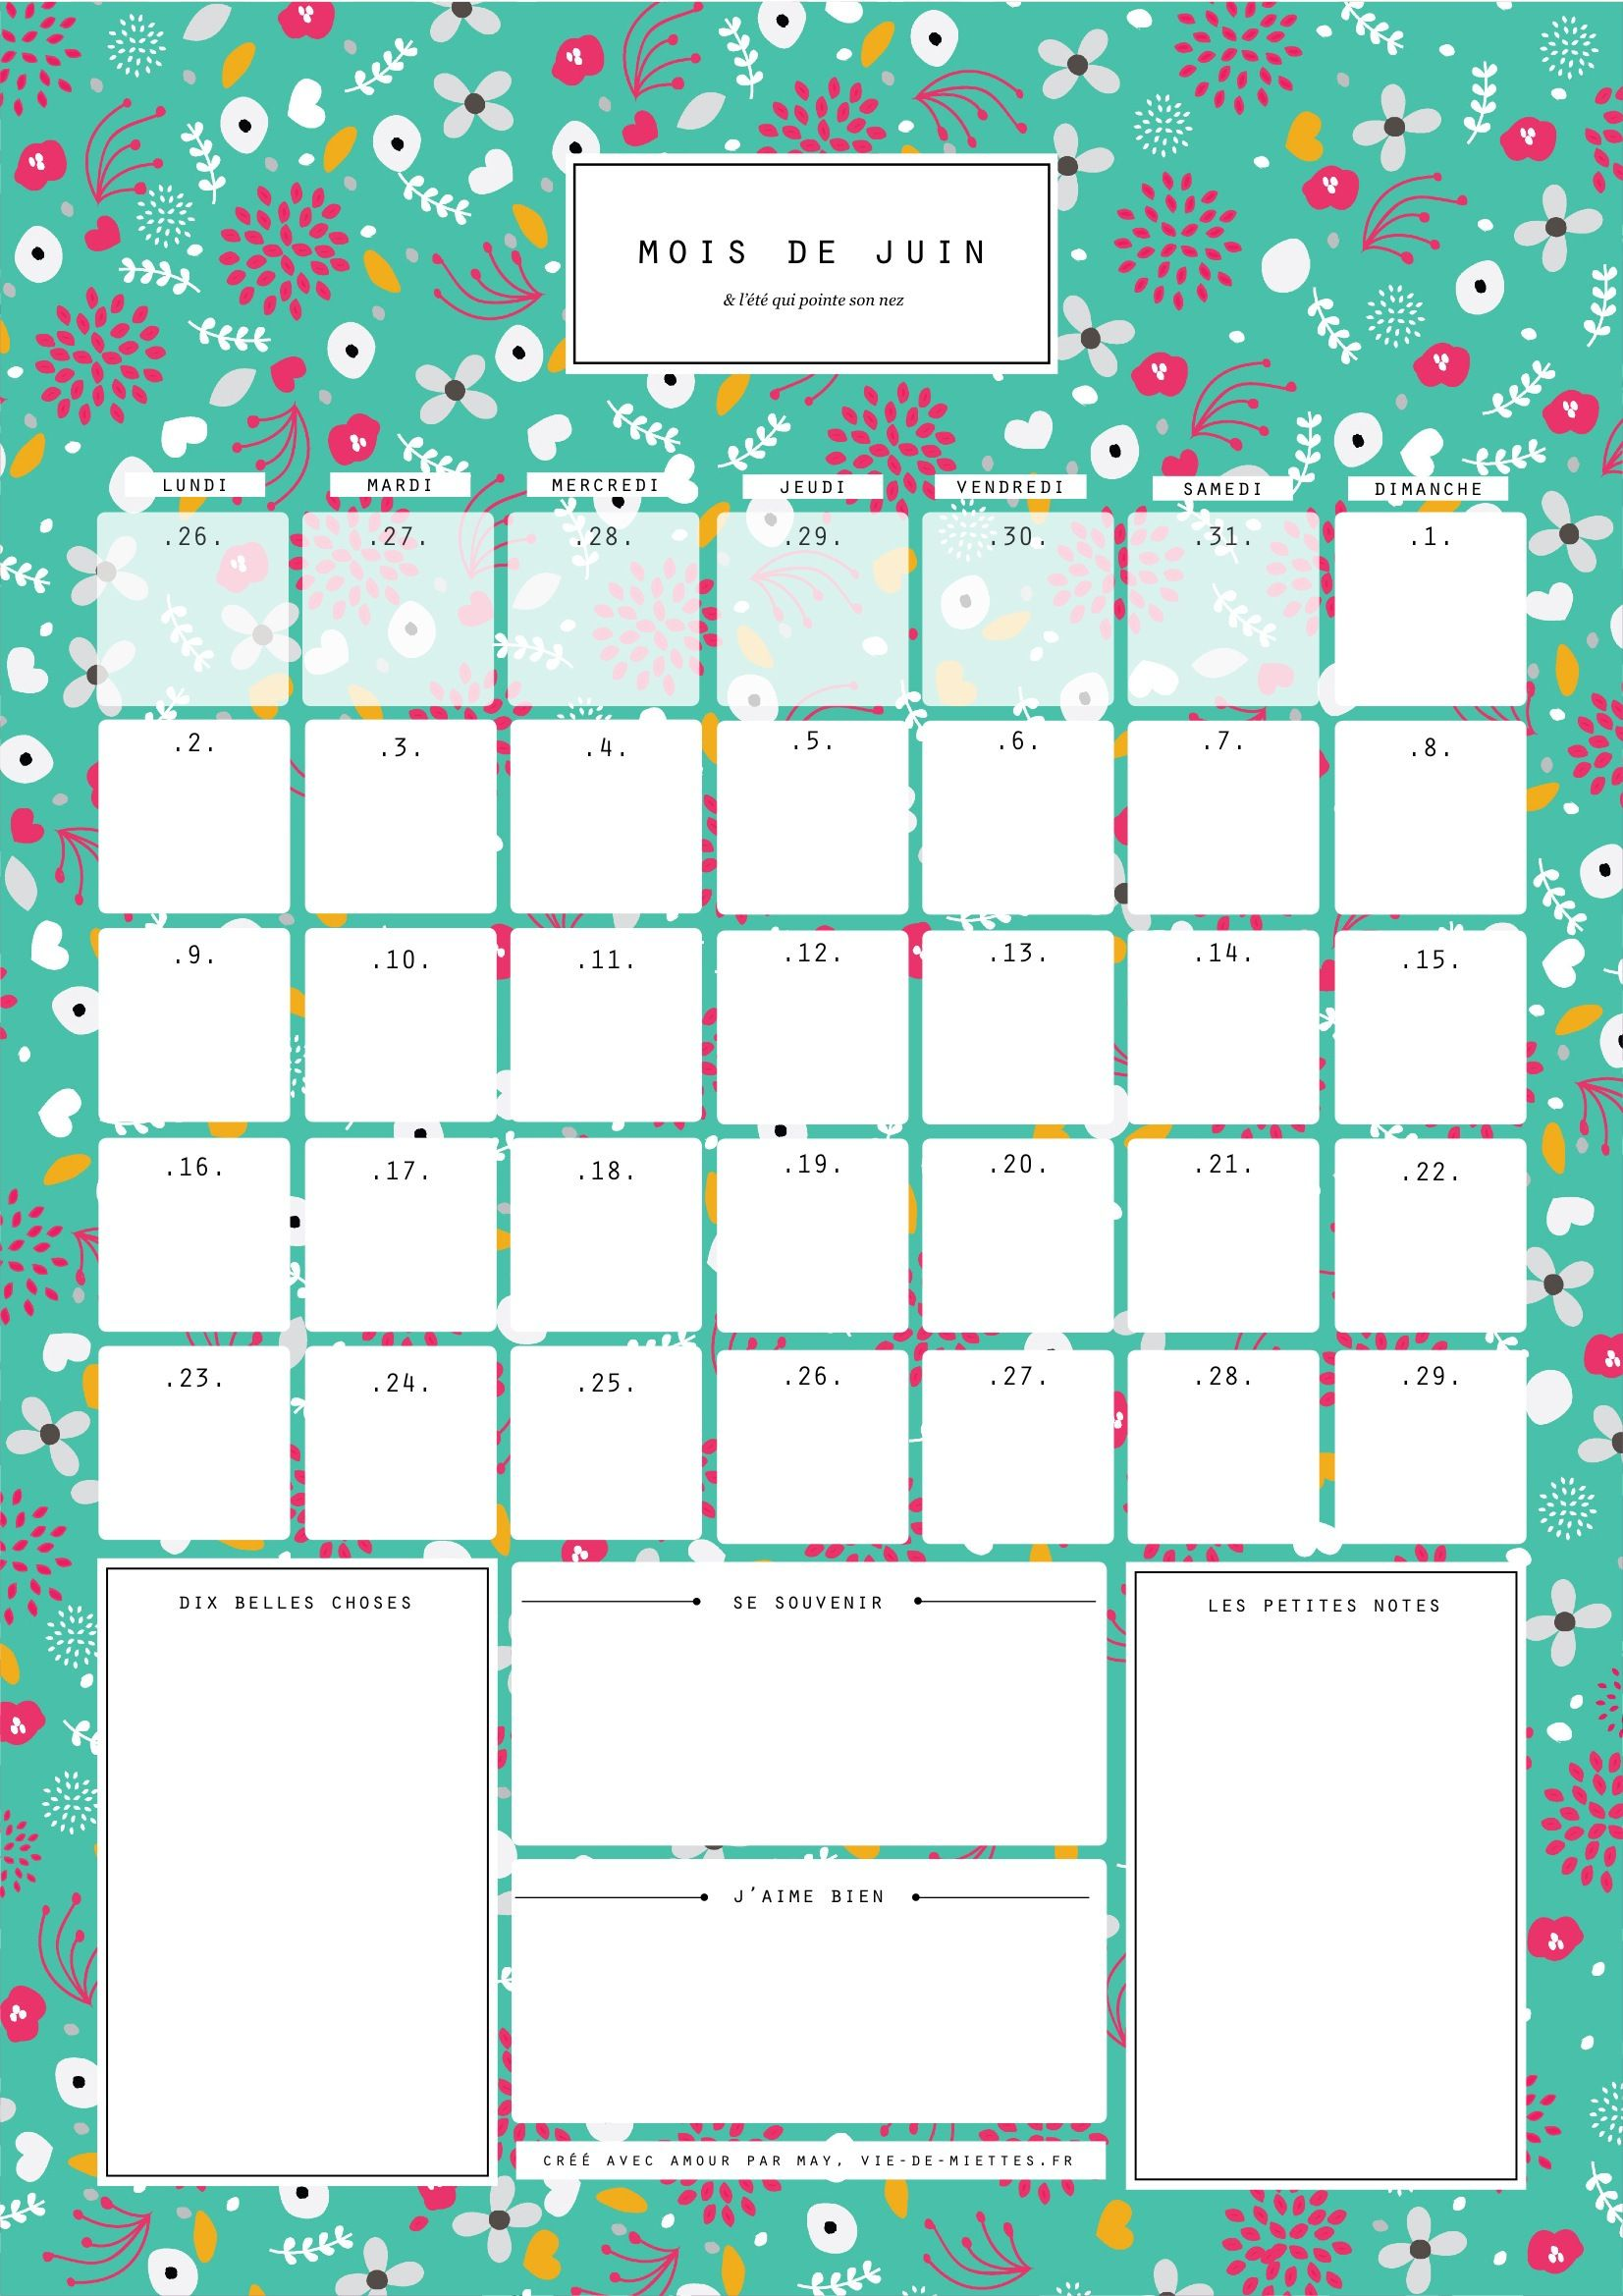 juin calendrier organisateur mensuel imprimer vie de miettes a imprimer pinterest. Black Bedroom Furniture Sets. Home Design Ideas